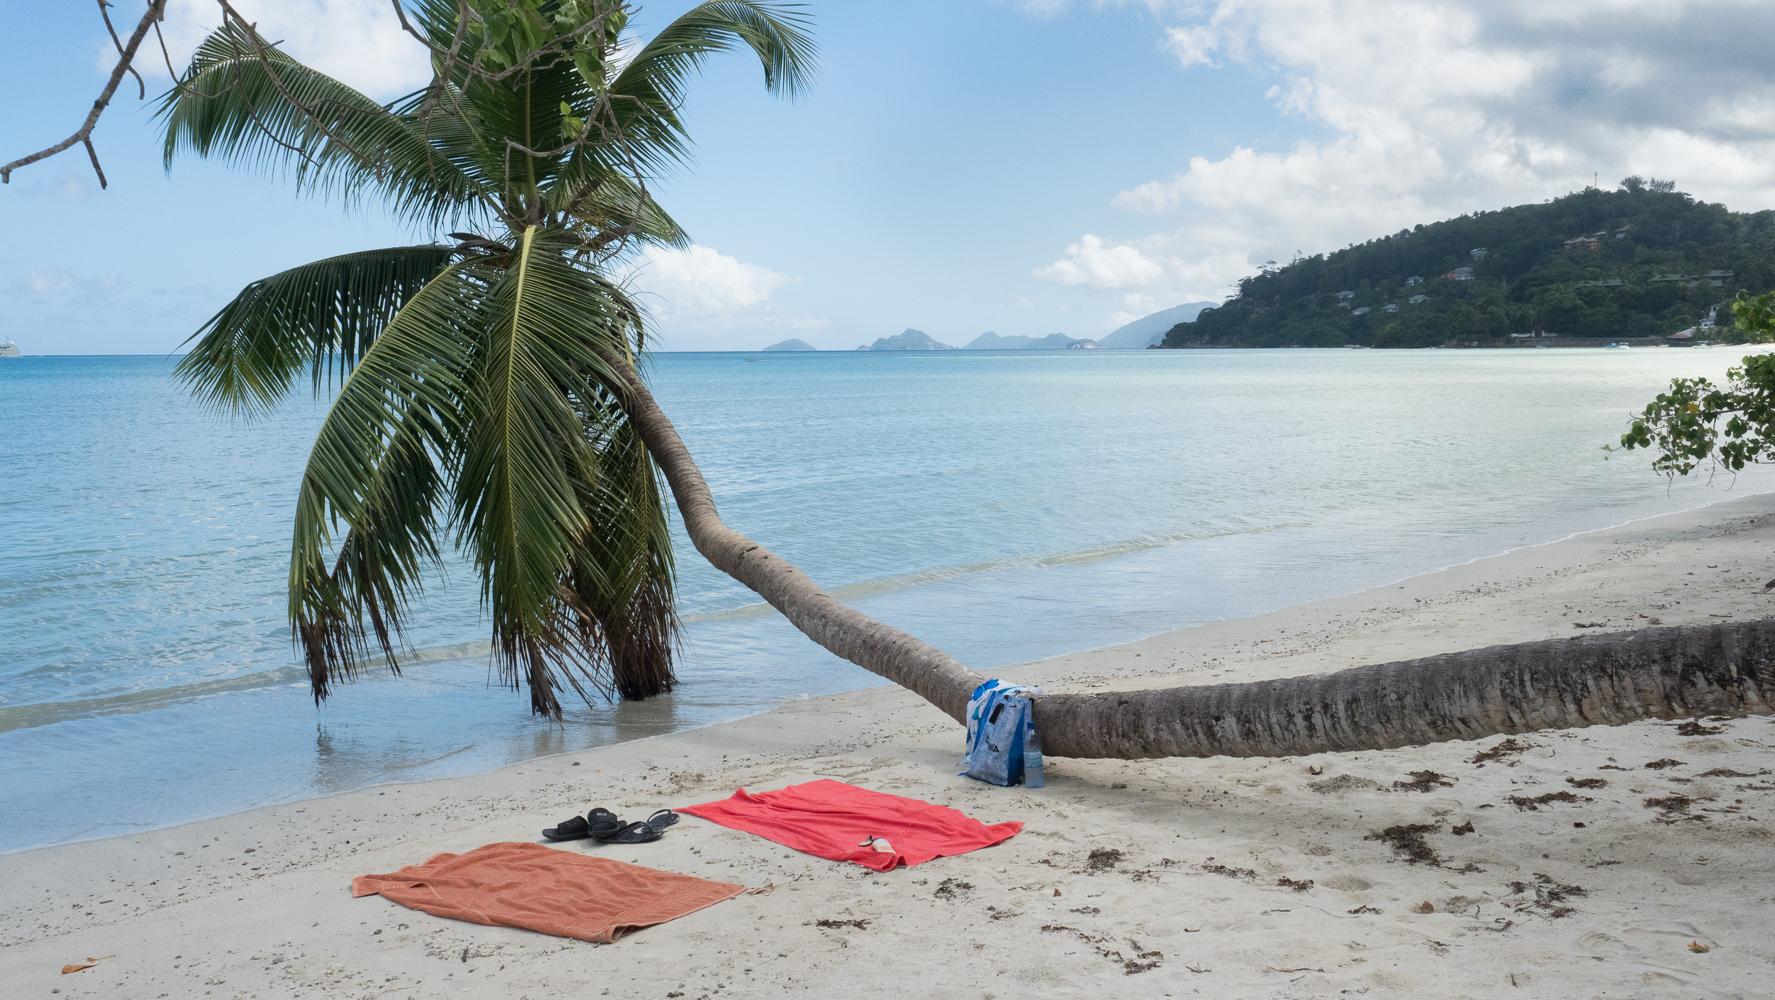 Beach symbol, Seychelles